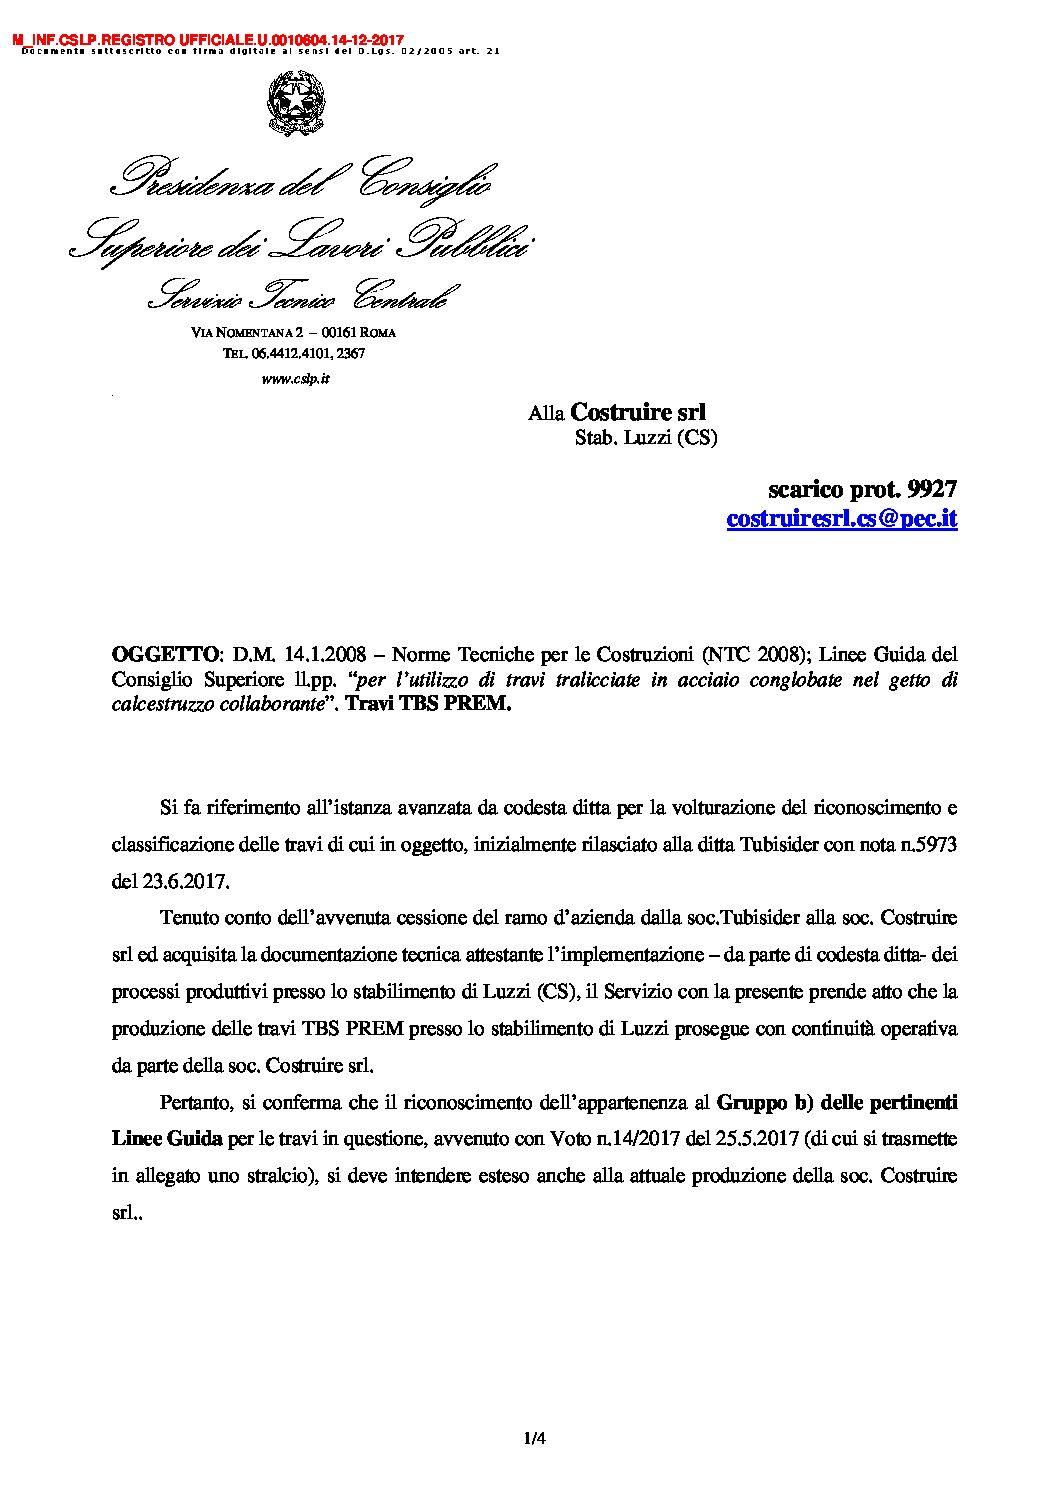 CSLP REGISTRO UFFICIALE 2017 0010604 pdf